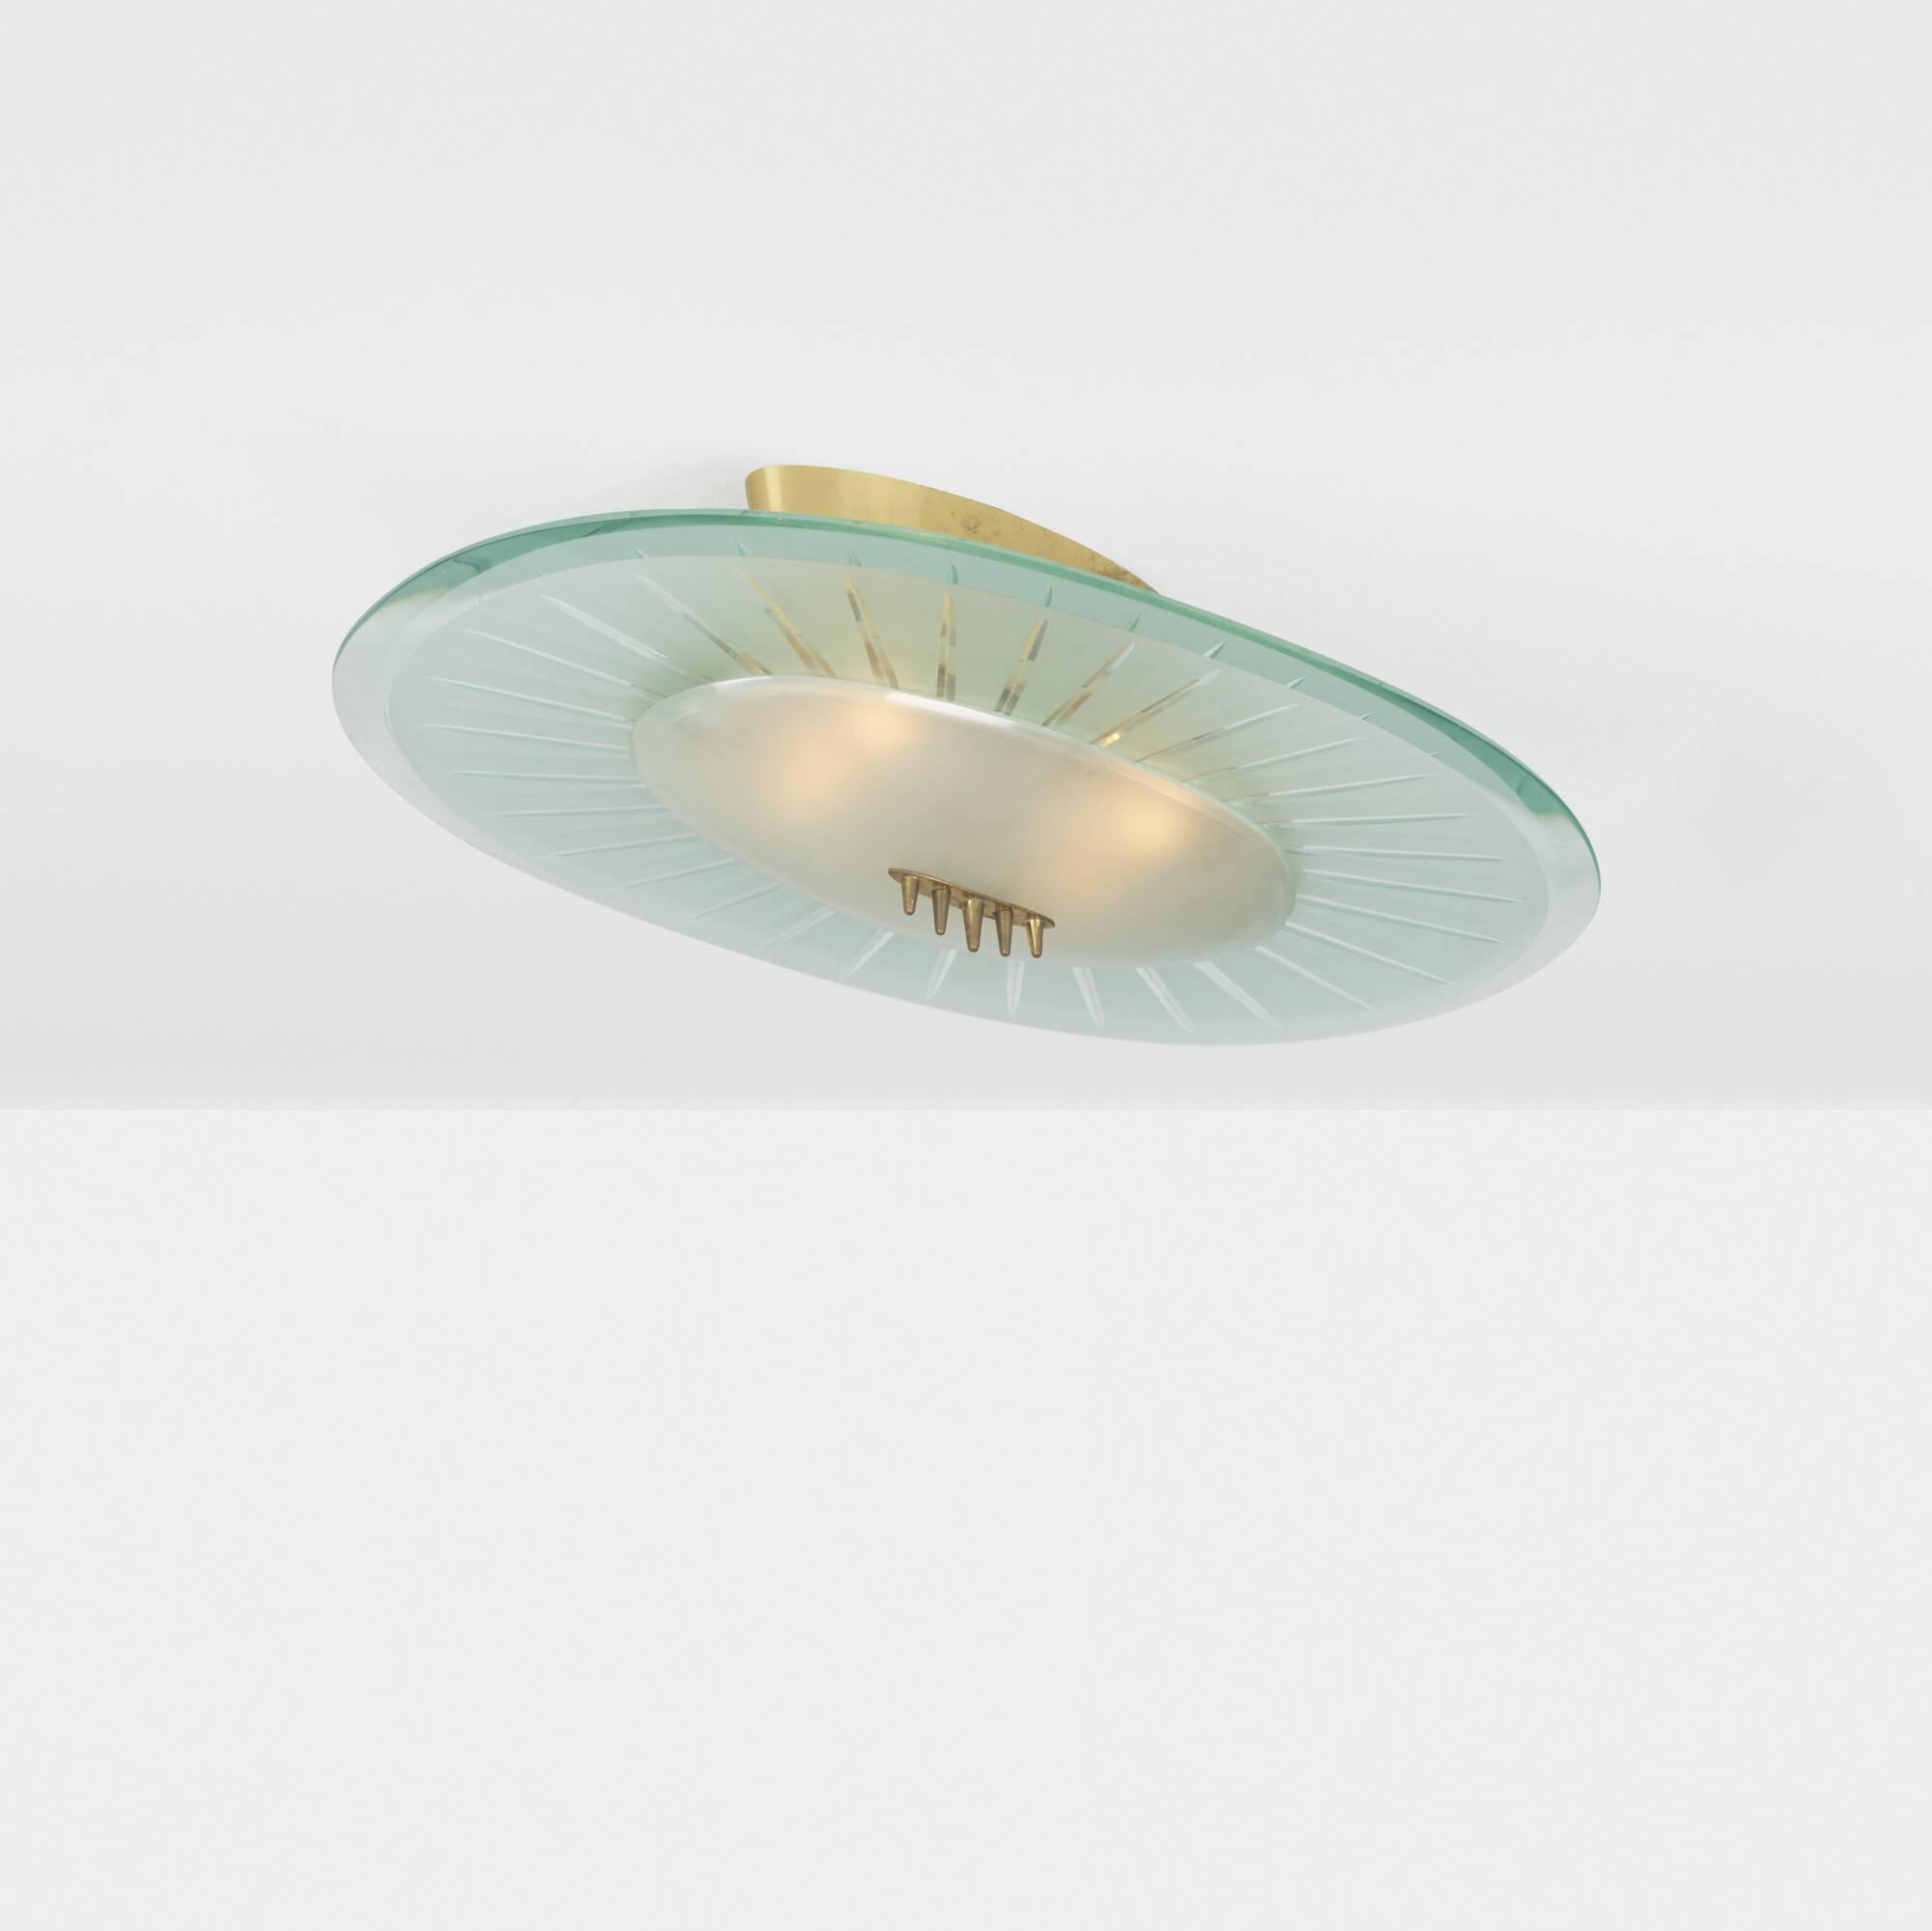 191: Pietro Chiesa / ceiling light (1 of 1)